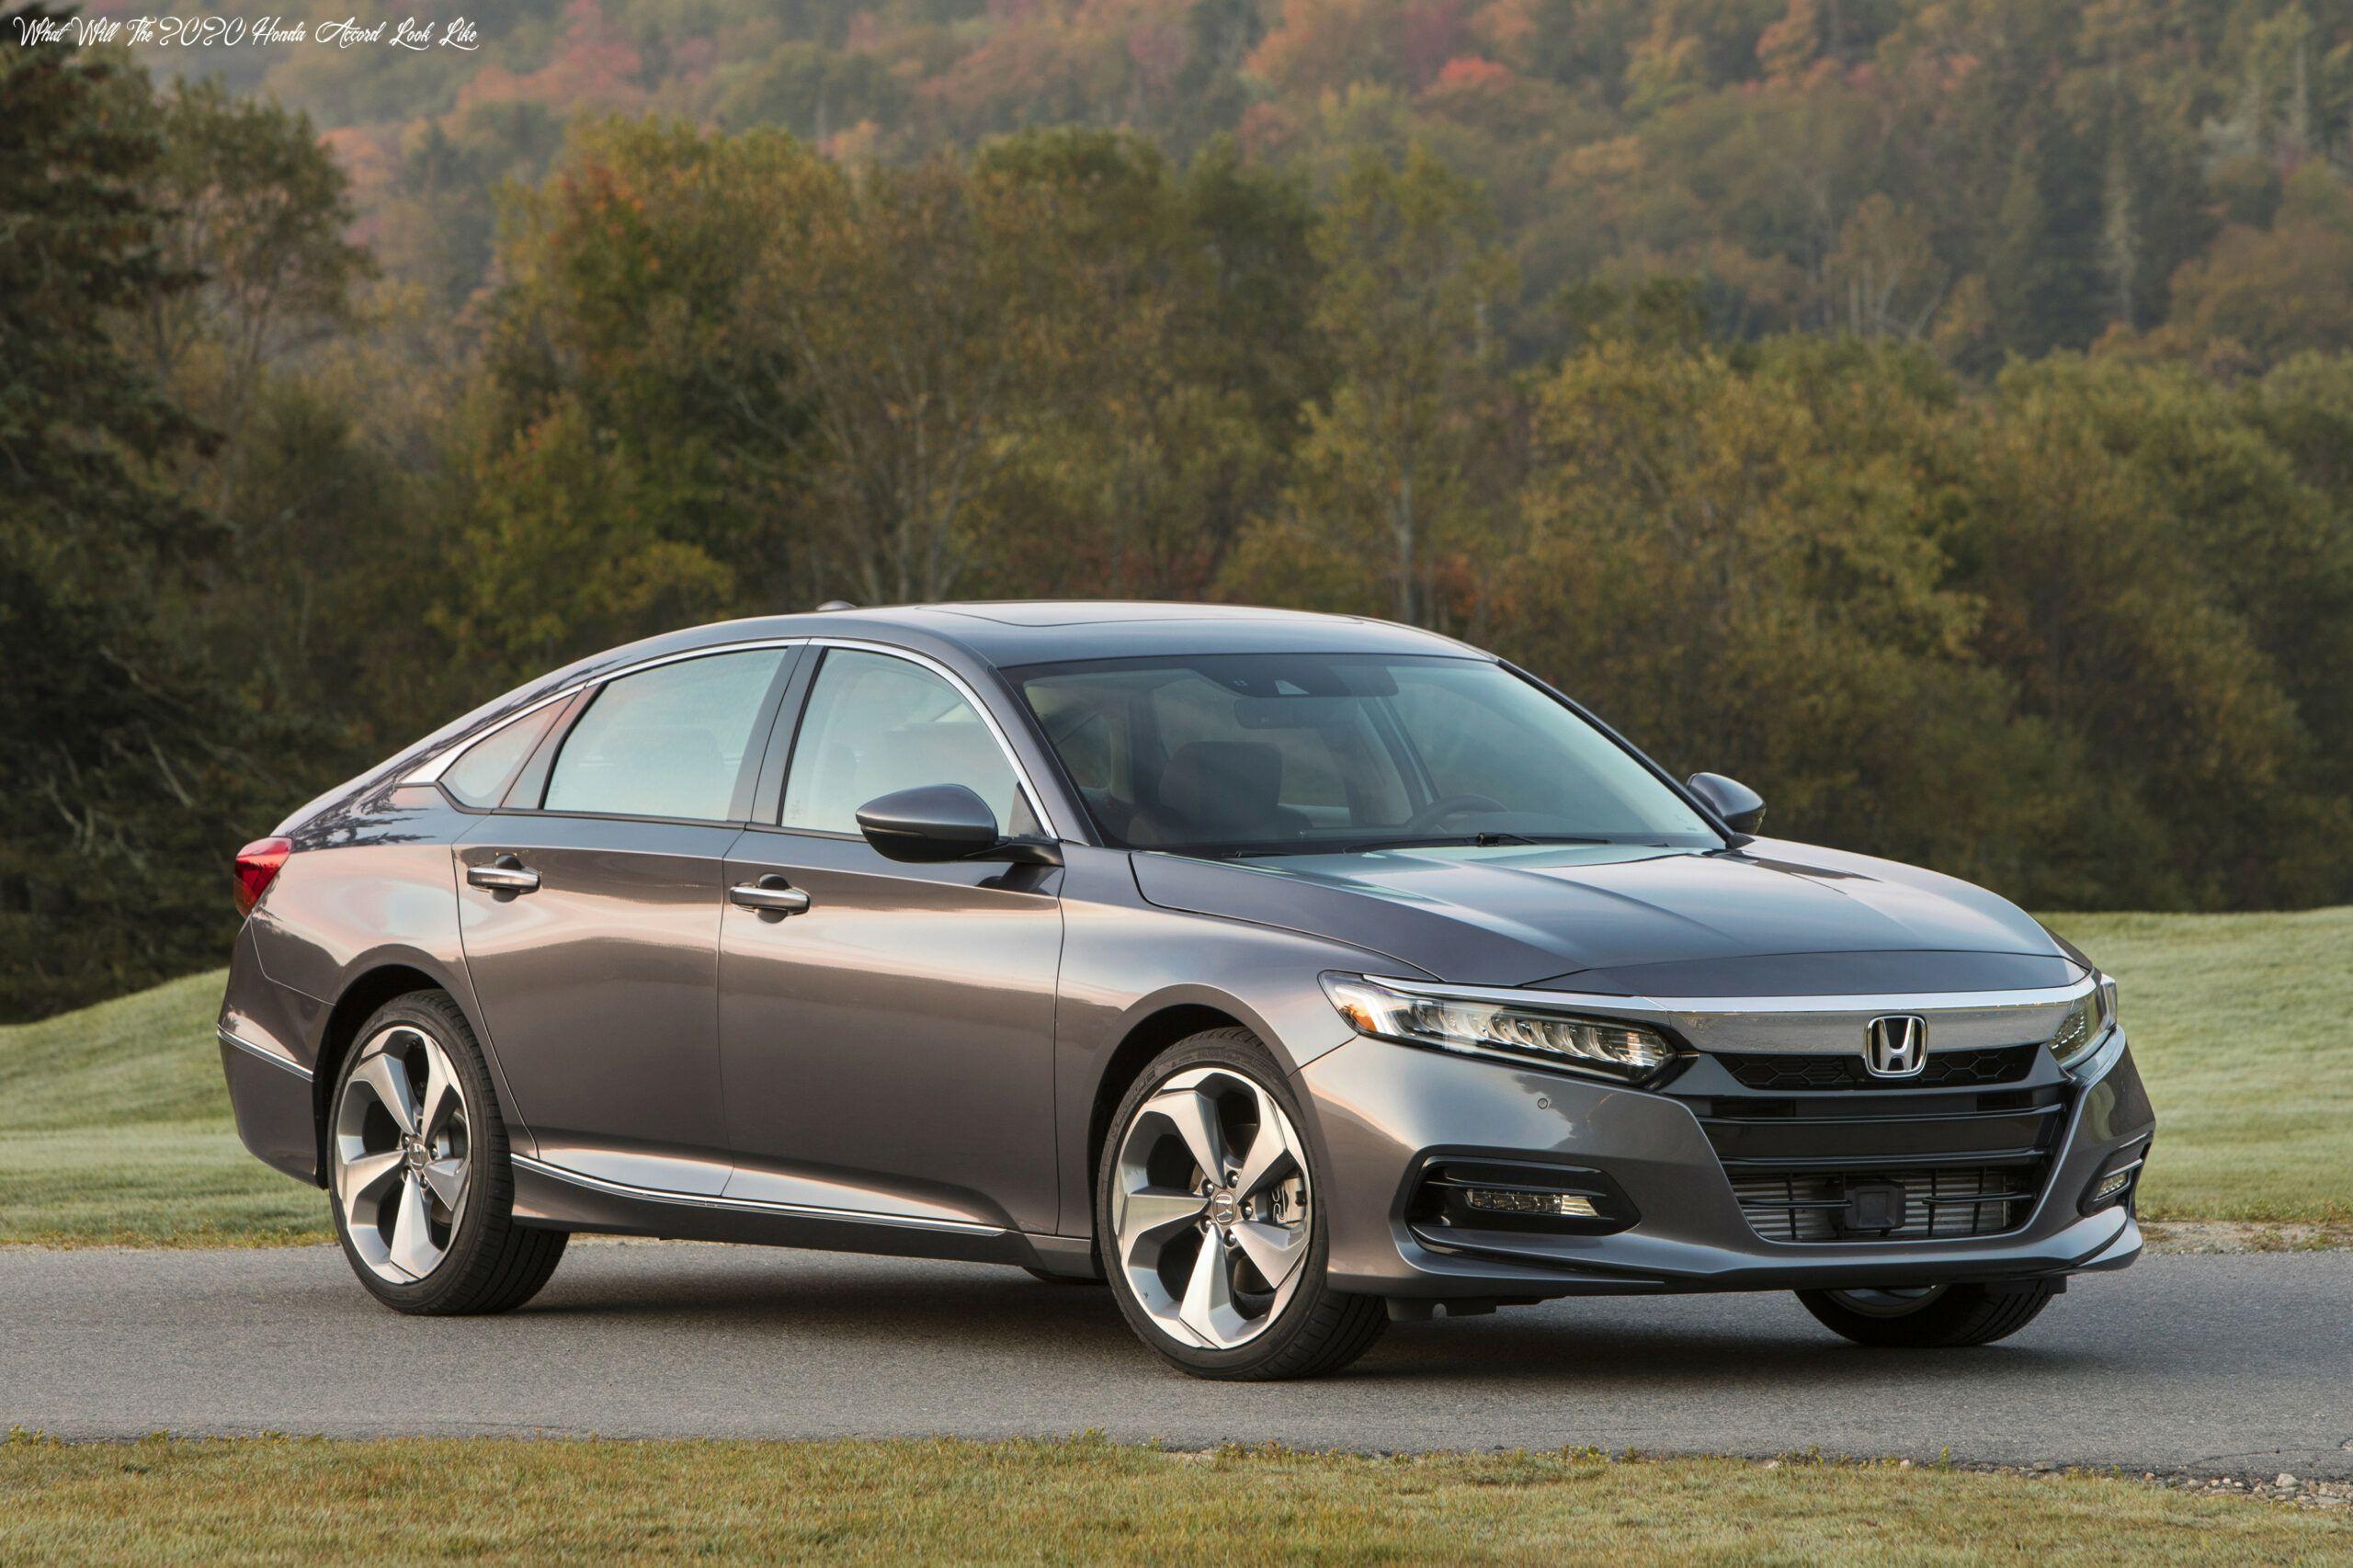 What Will The 2020 Honda Accord Look Like Performance And New Engine In 2020 Honda Accord Touring Honda Accord 2018 Honda Accord